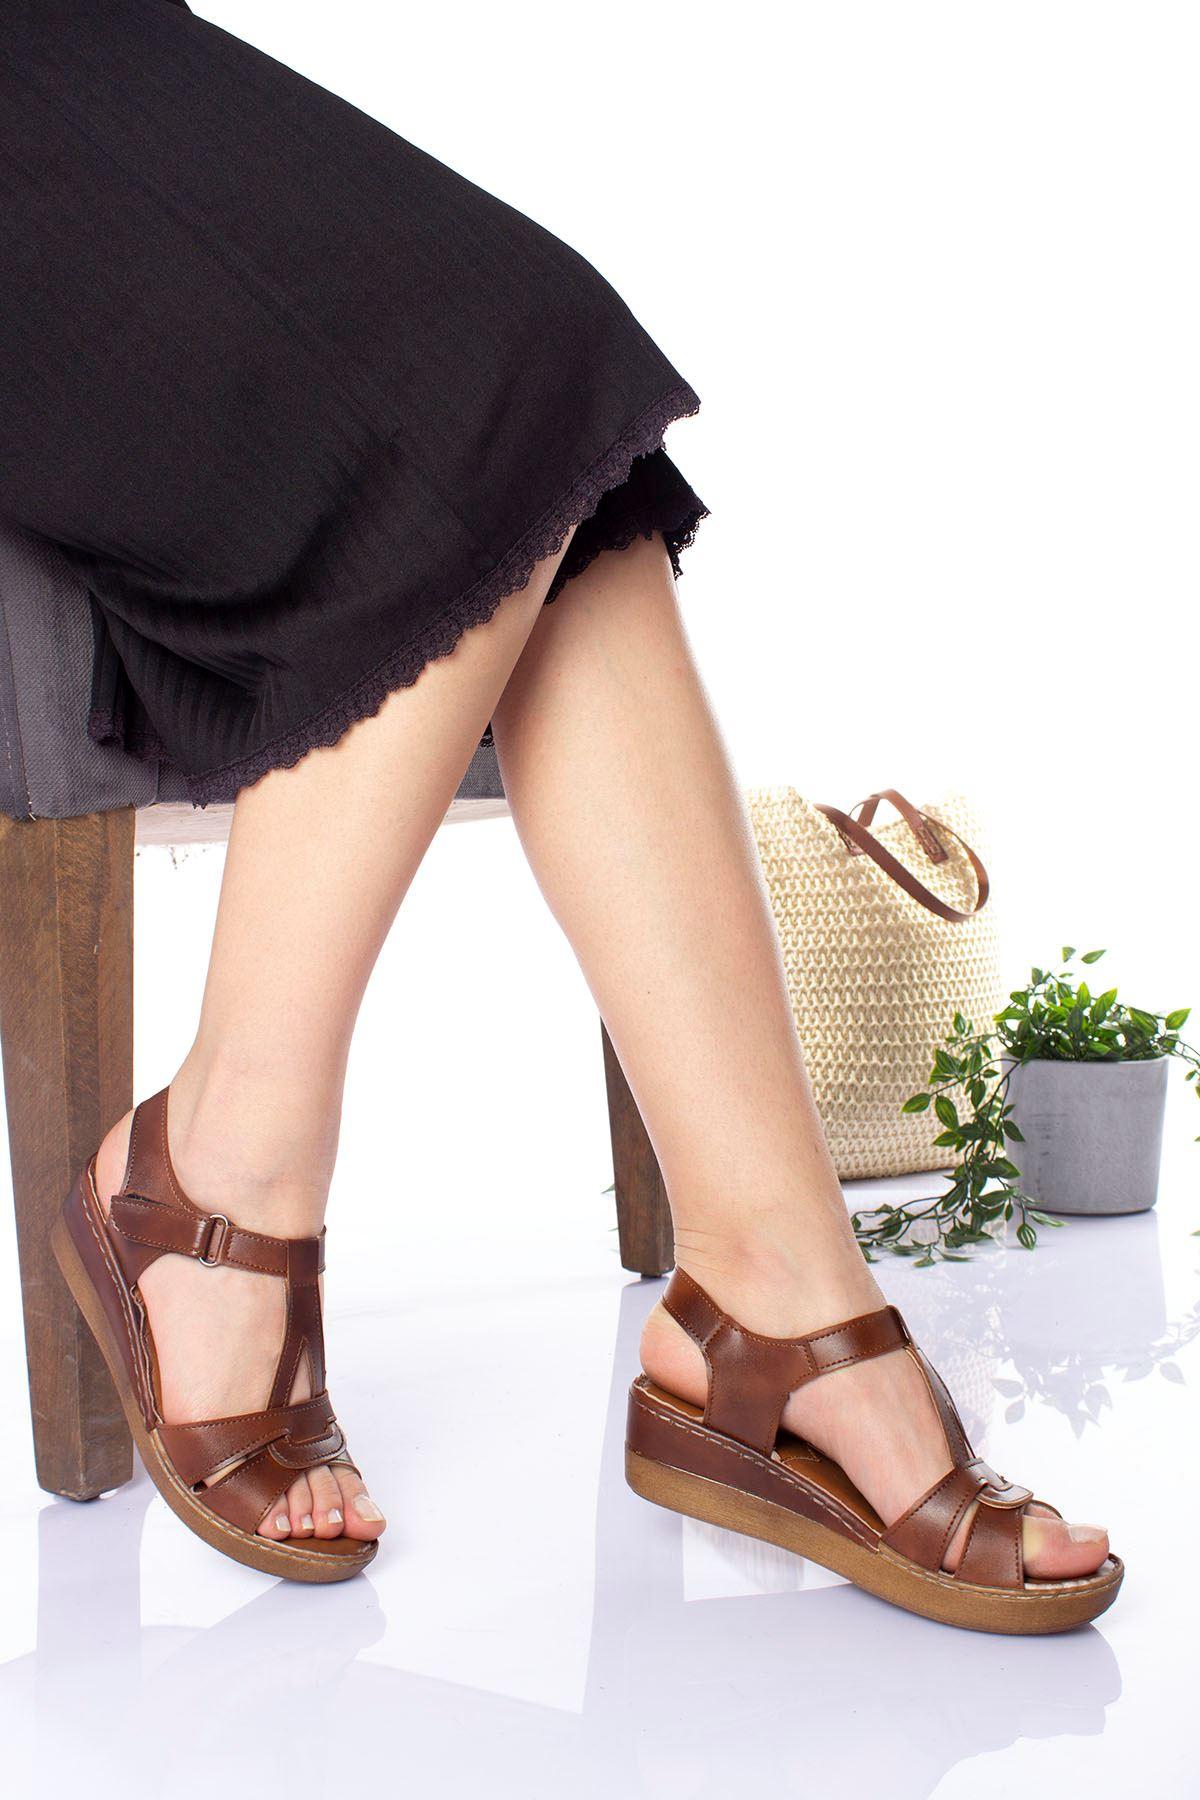 Ortopedik Ped İçi Deri Orta Taban Kahverengi Sandalet